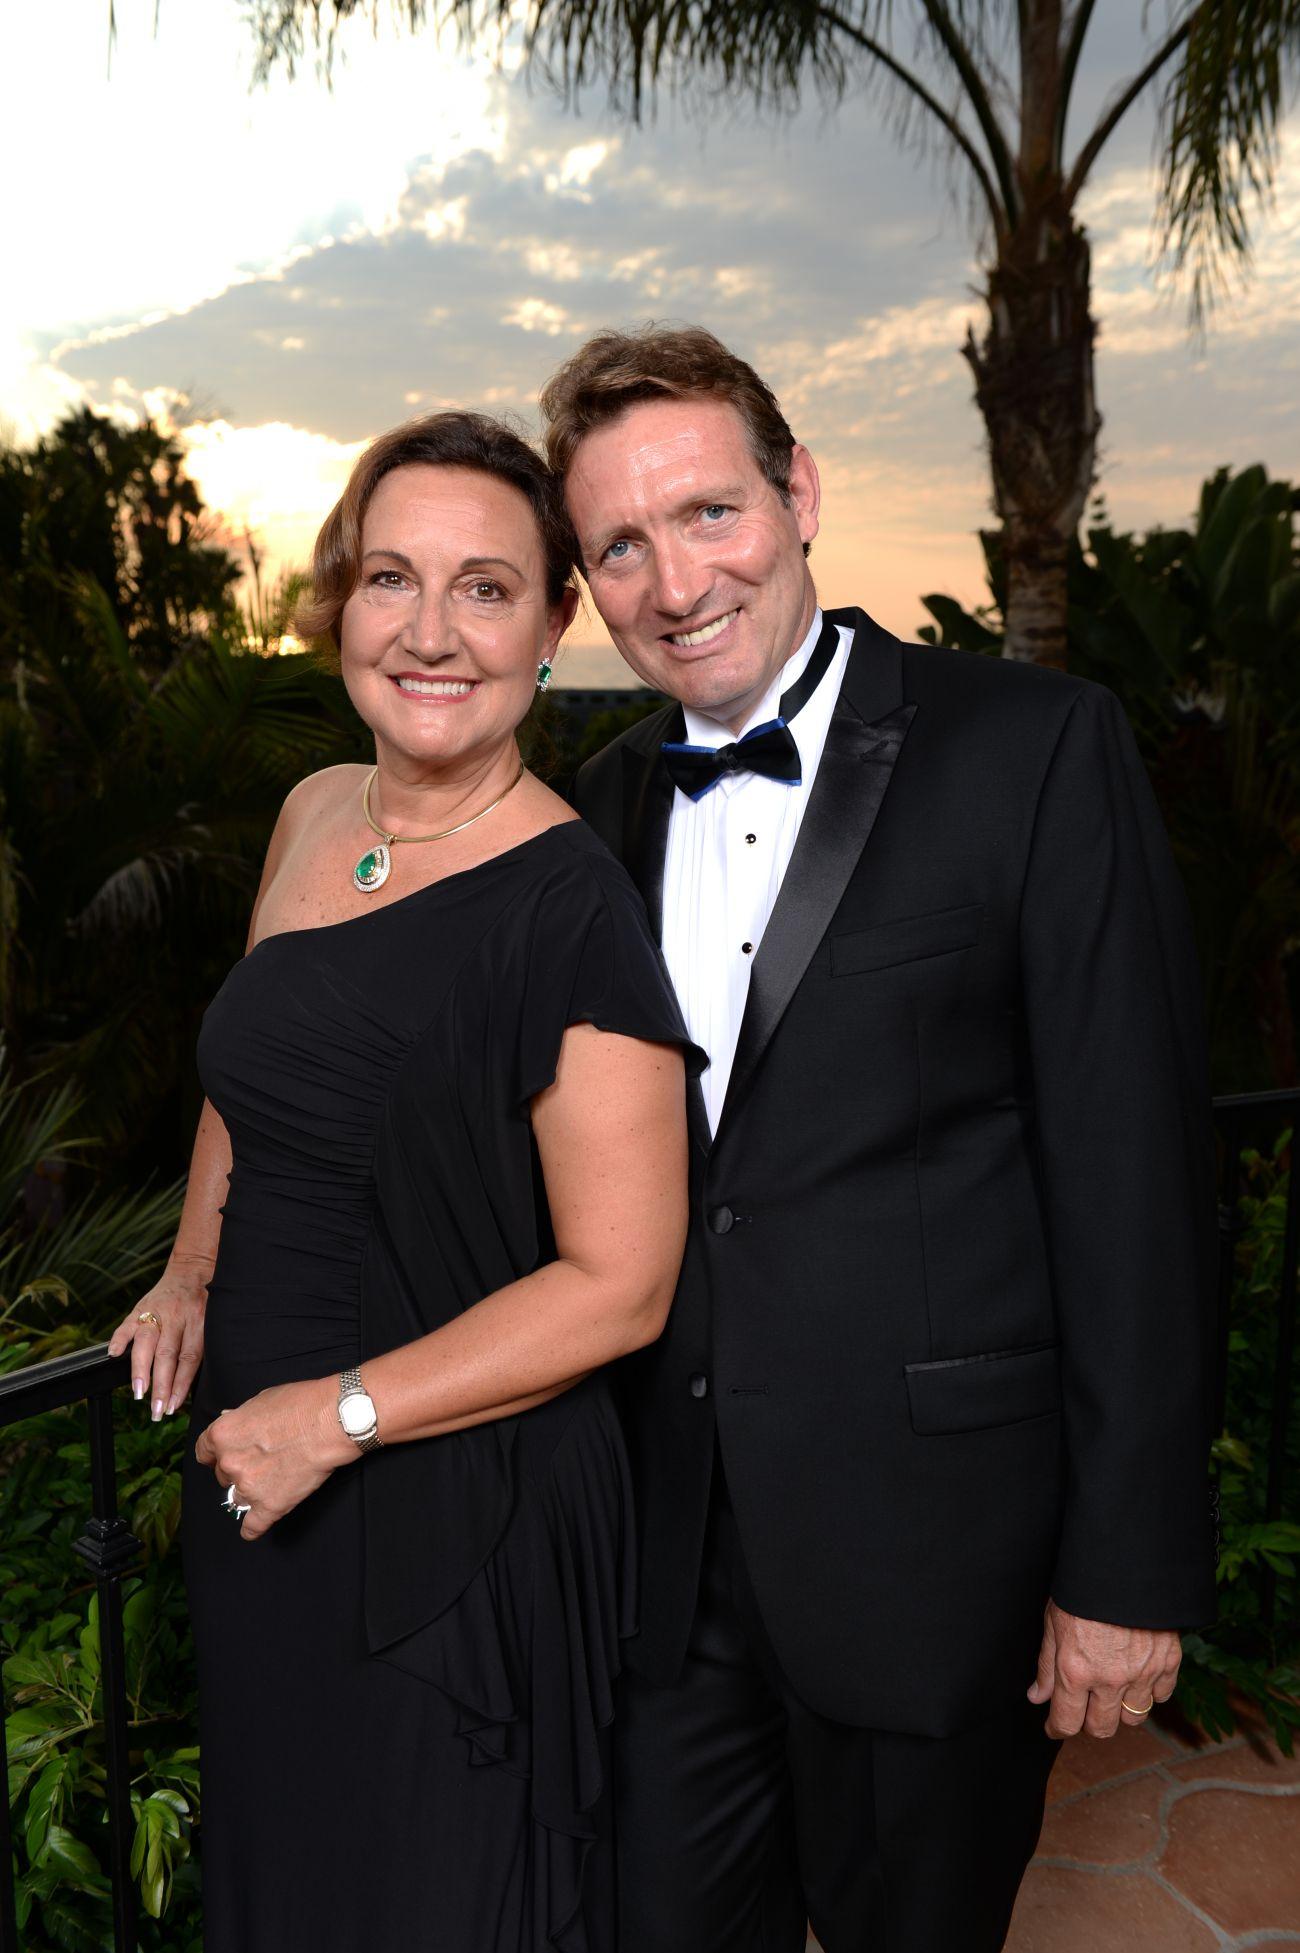 Dr. Magda Marquet & Dr. Francois Ferre